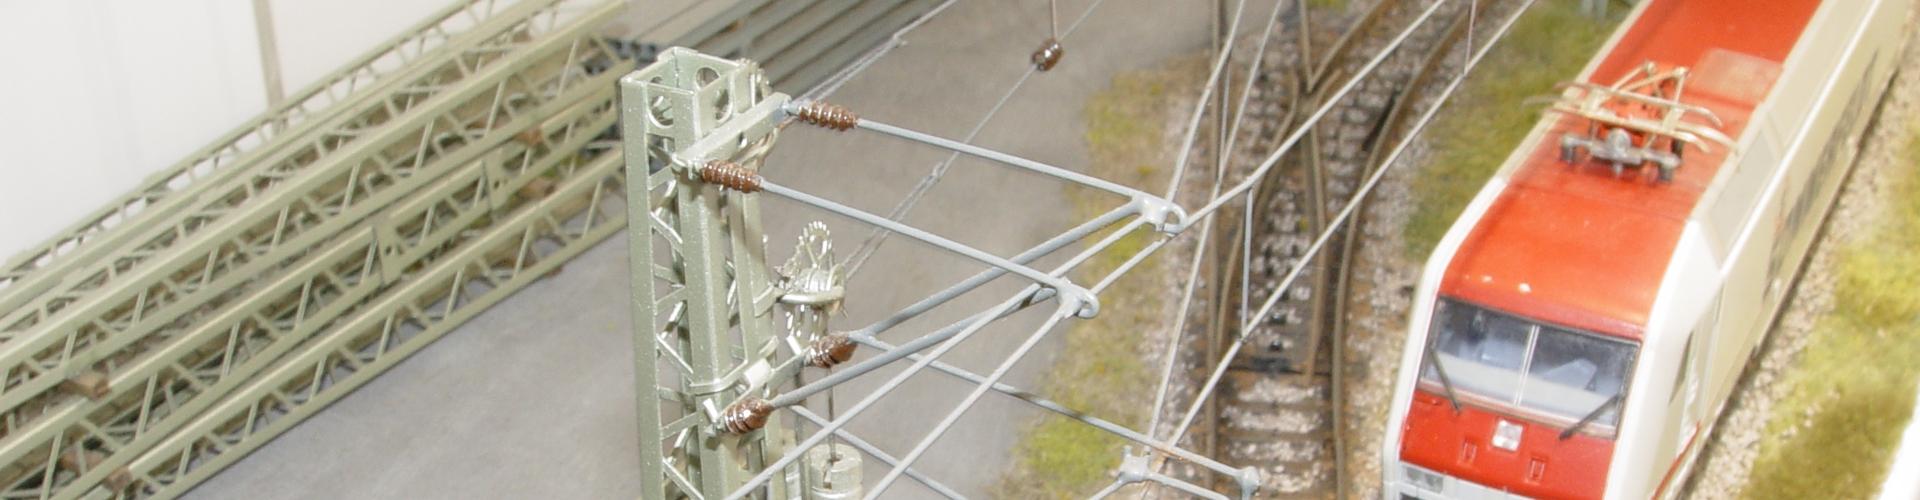 H0//H0m 140mm hoch 2 Stück Sommerfeldt 125 Turmmast lackiert